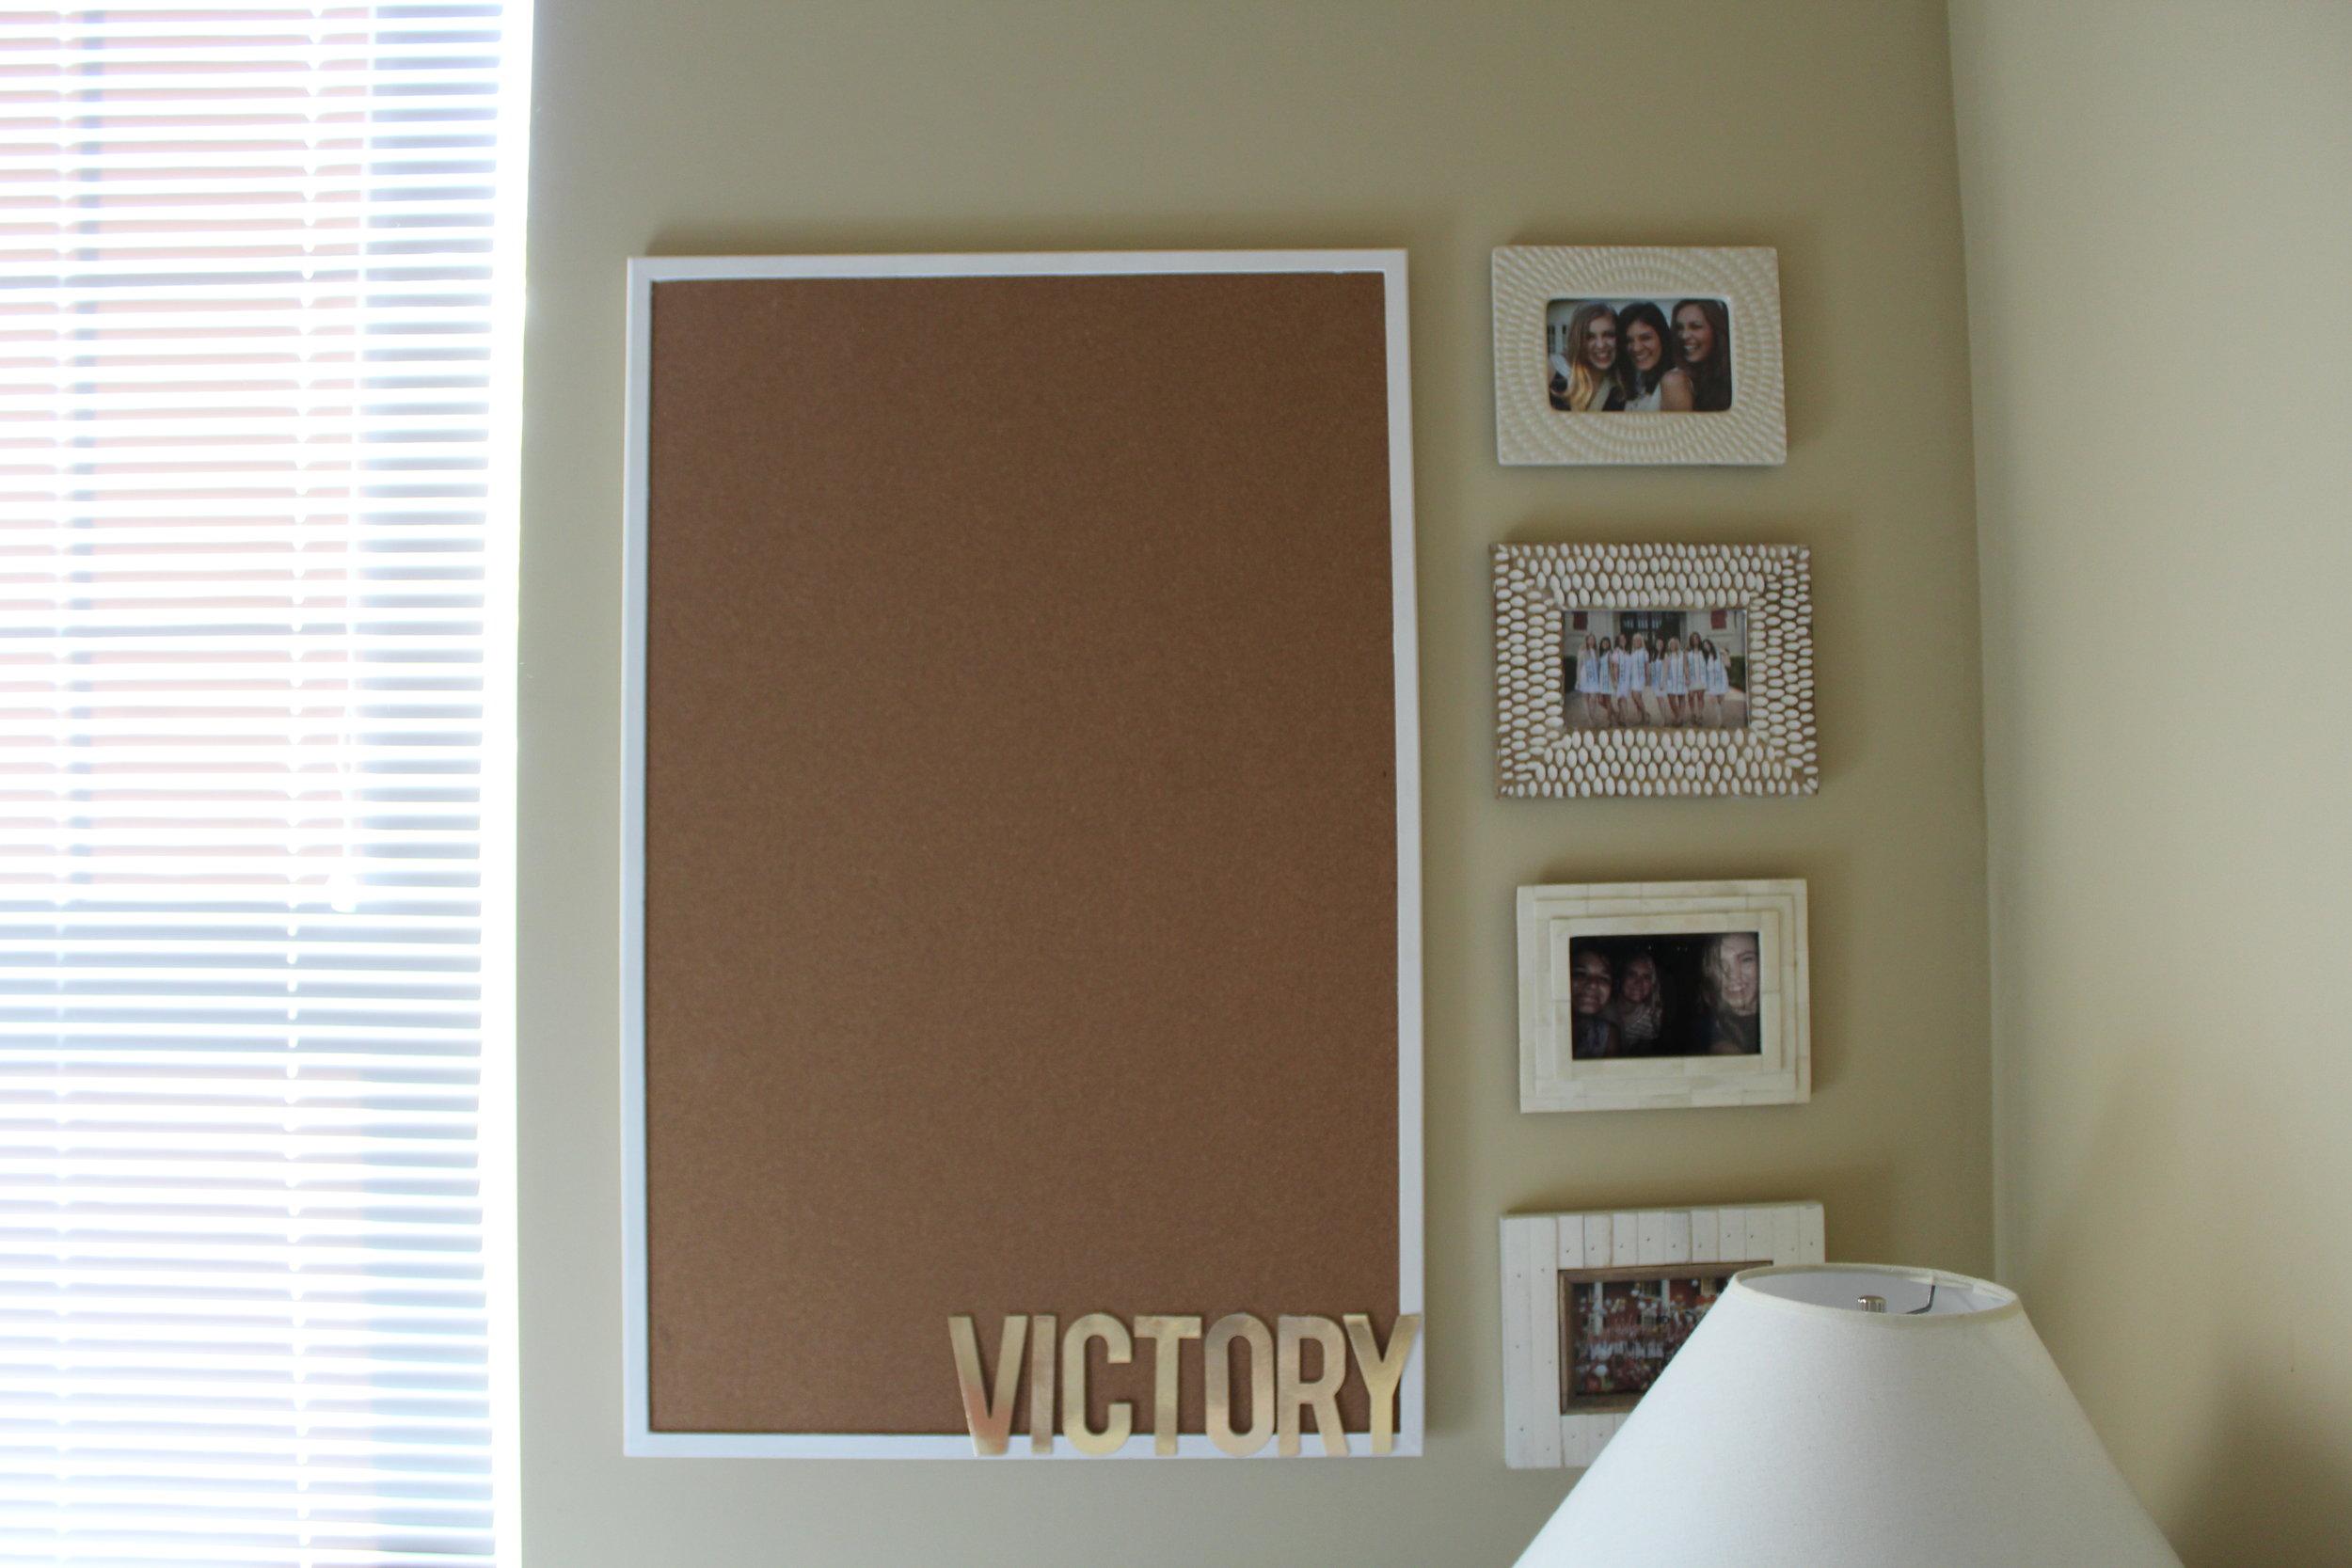 victory board 000